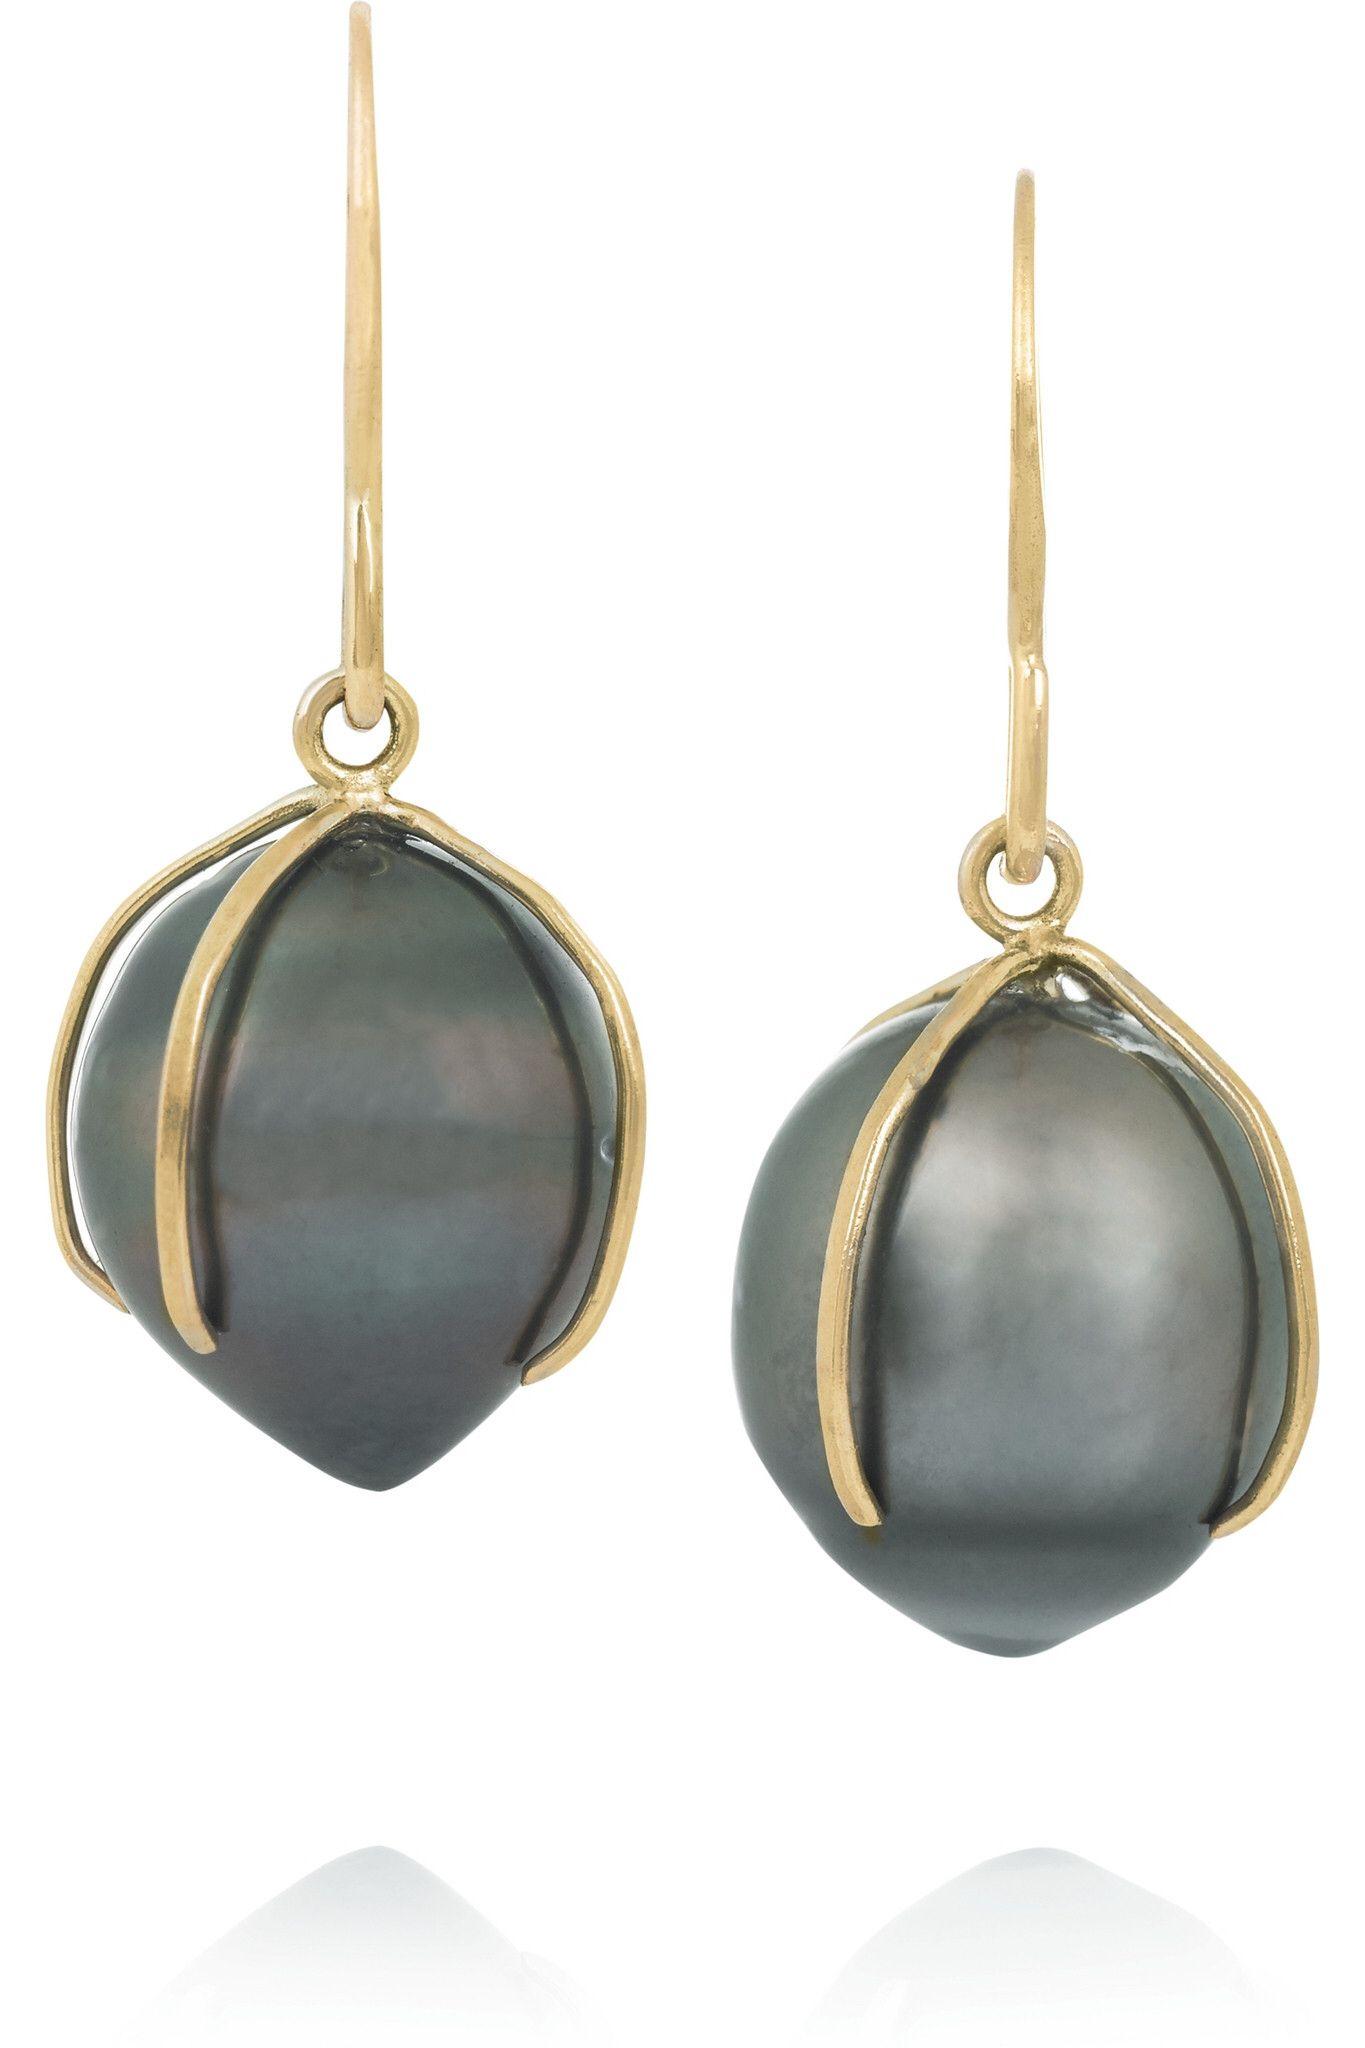 MELISSA JOY MANNING 14-karat gold pearl earrings $515 http://www.net-a-porter.com/products/514543